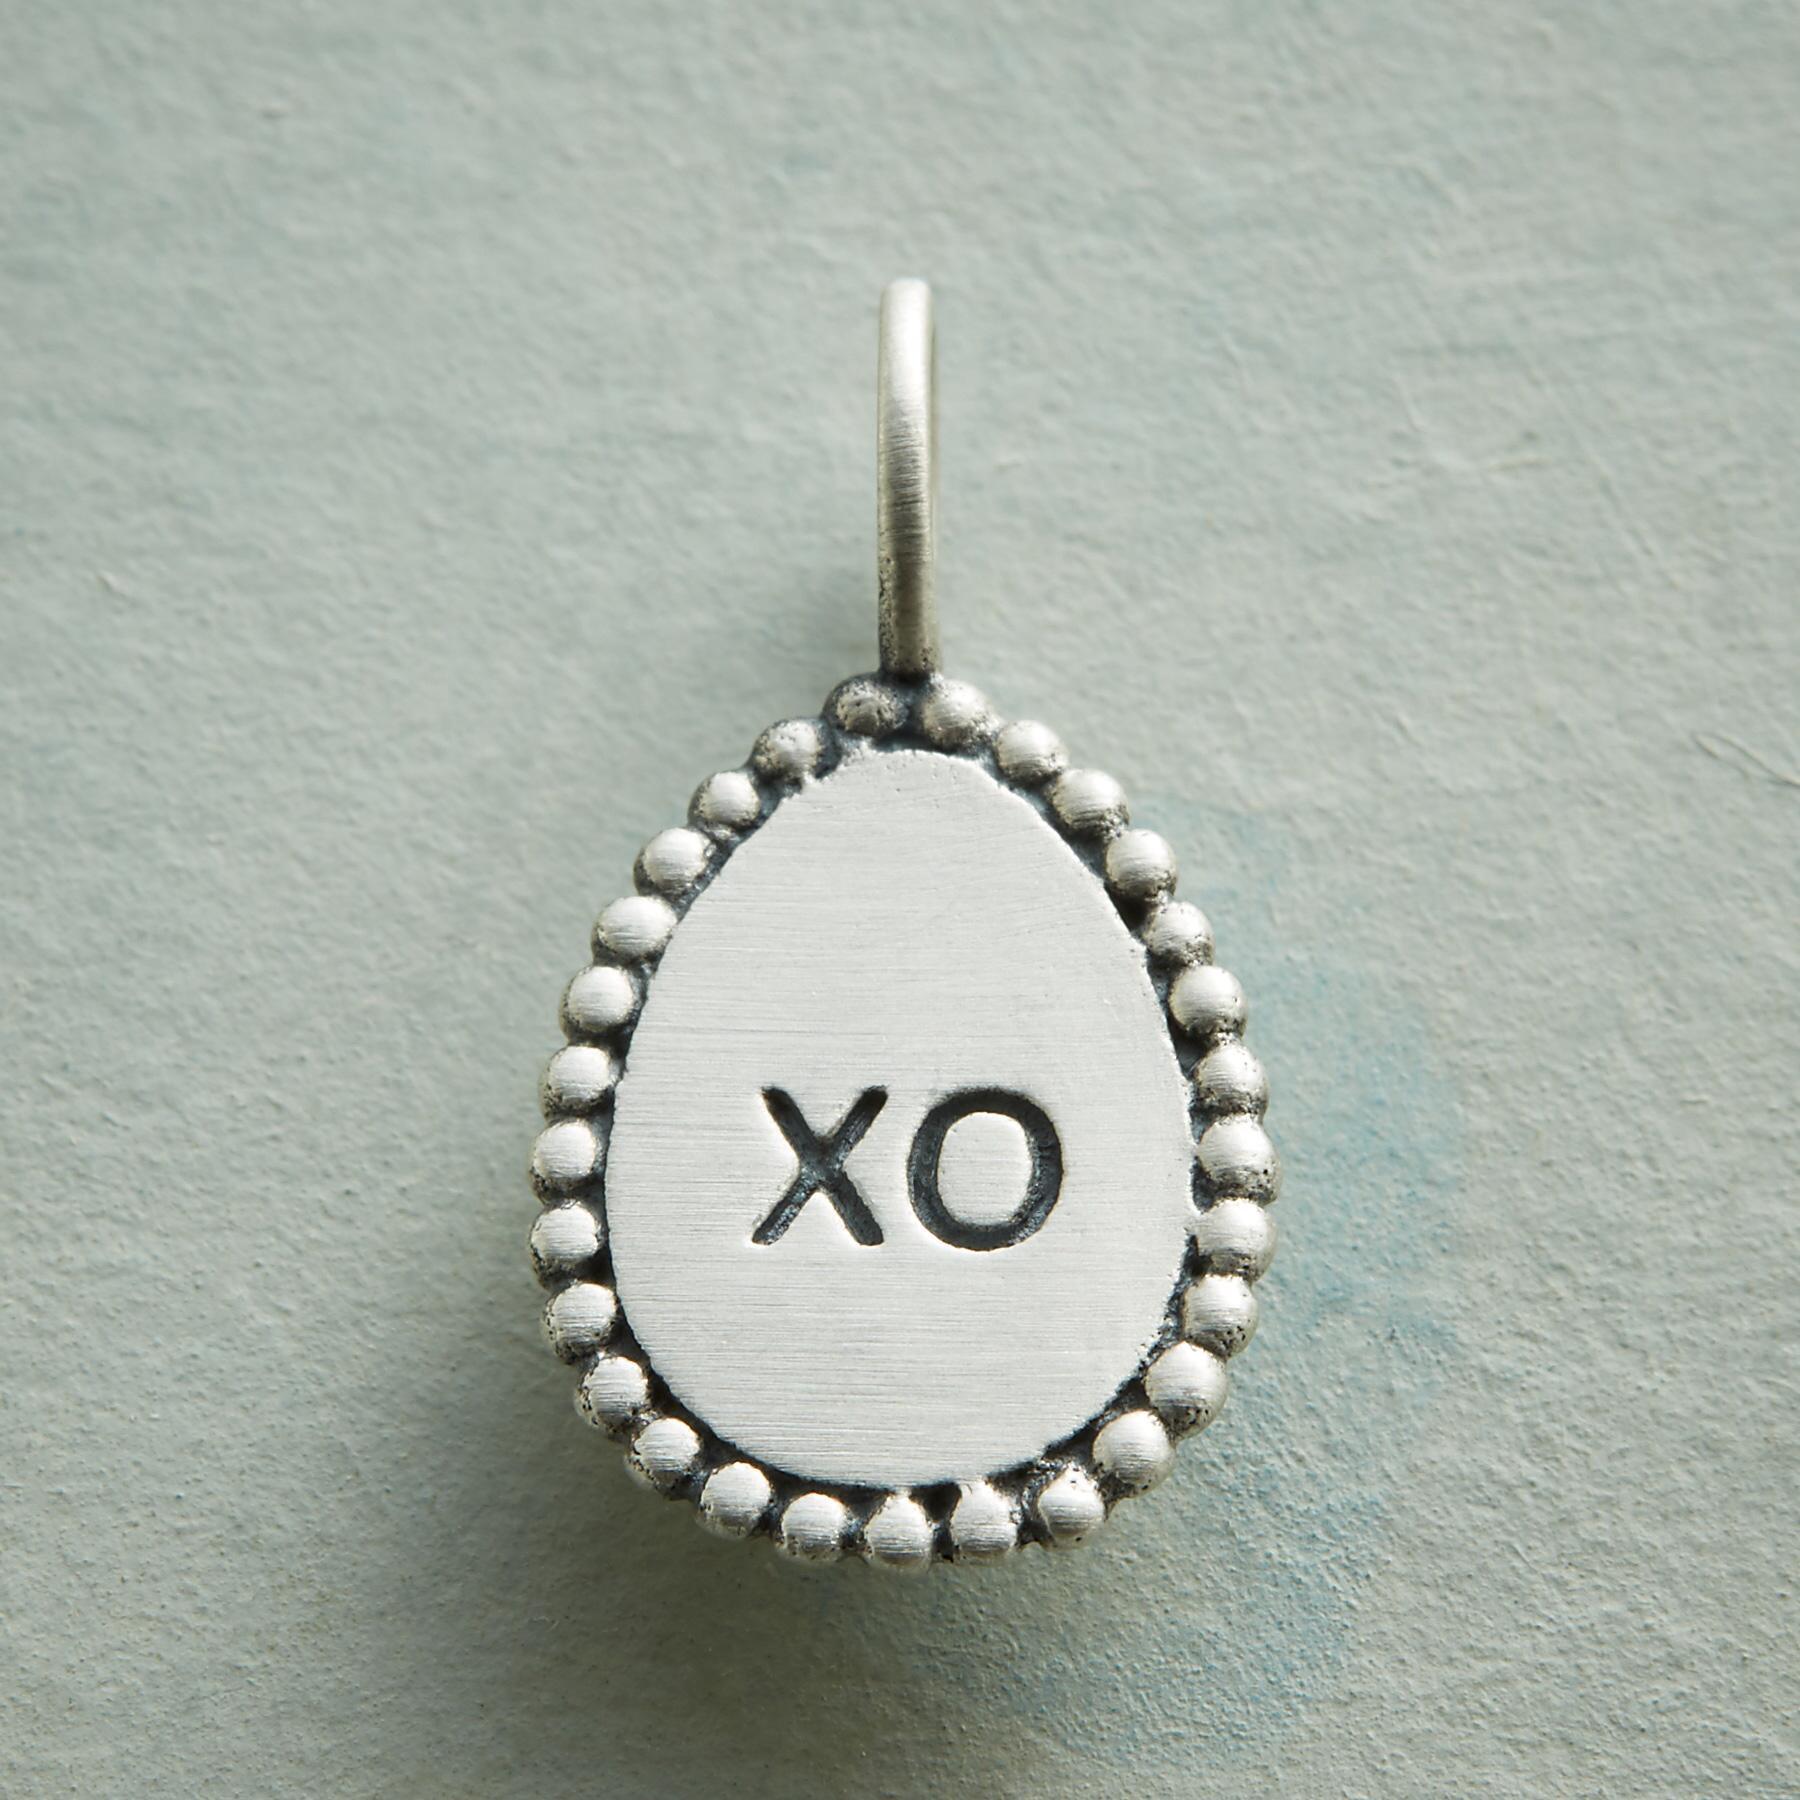 XO CHARM: View 1